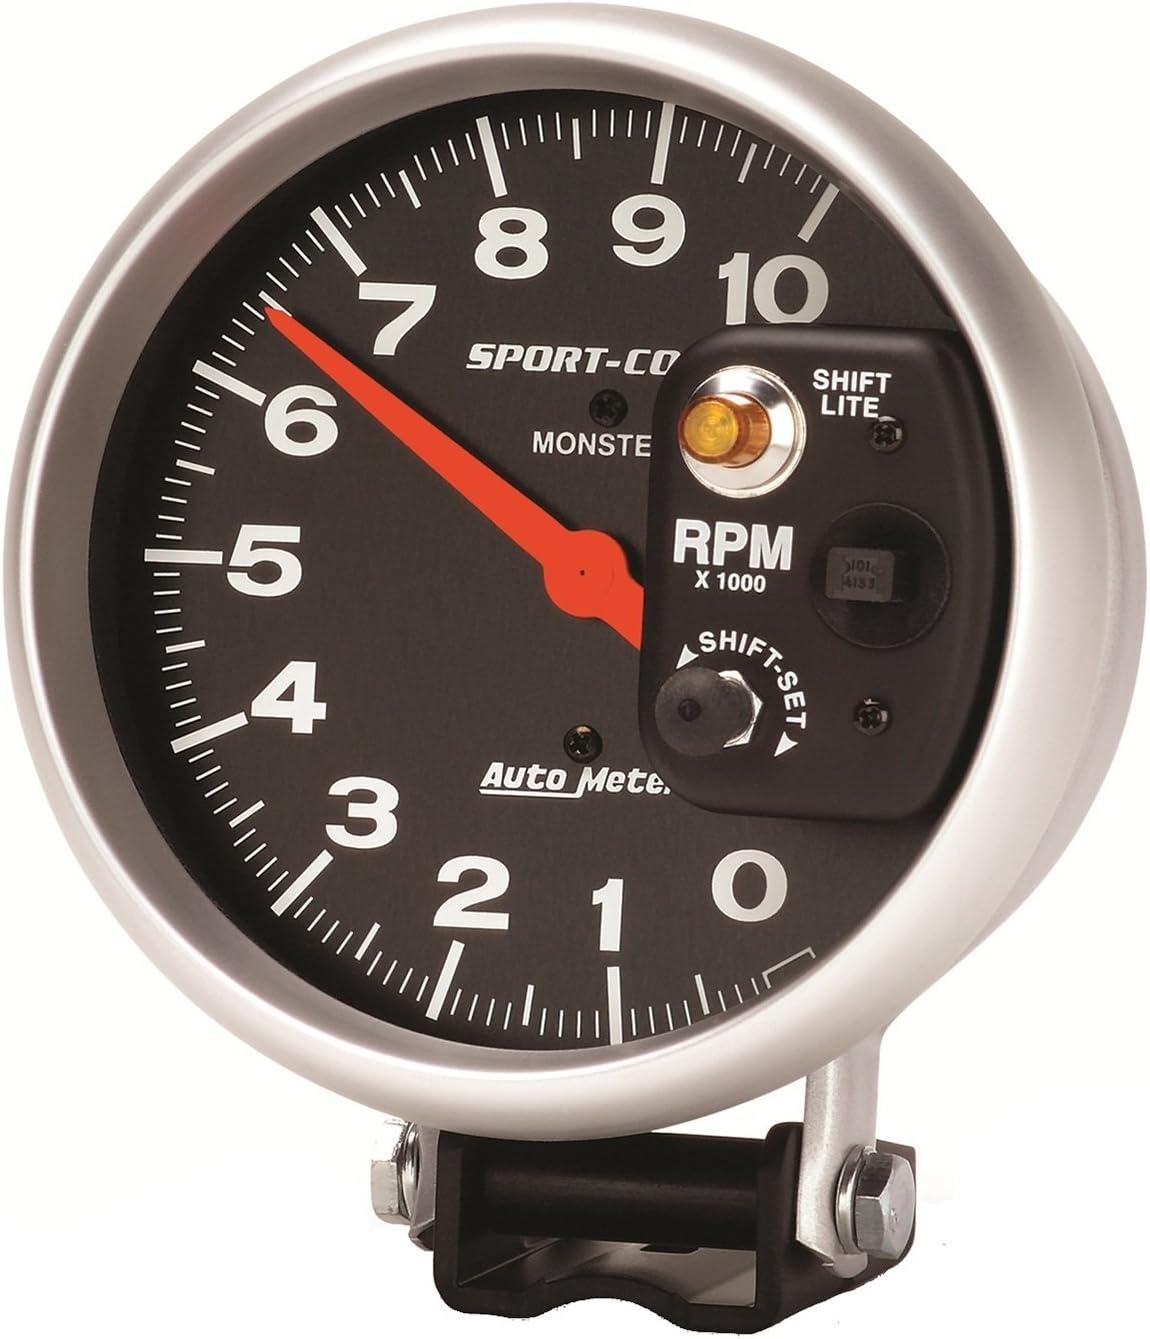 Auto Meter 3903 Sport-Comp Shift-Lite Tachometer